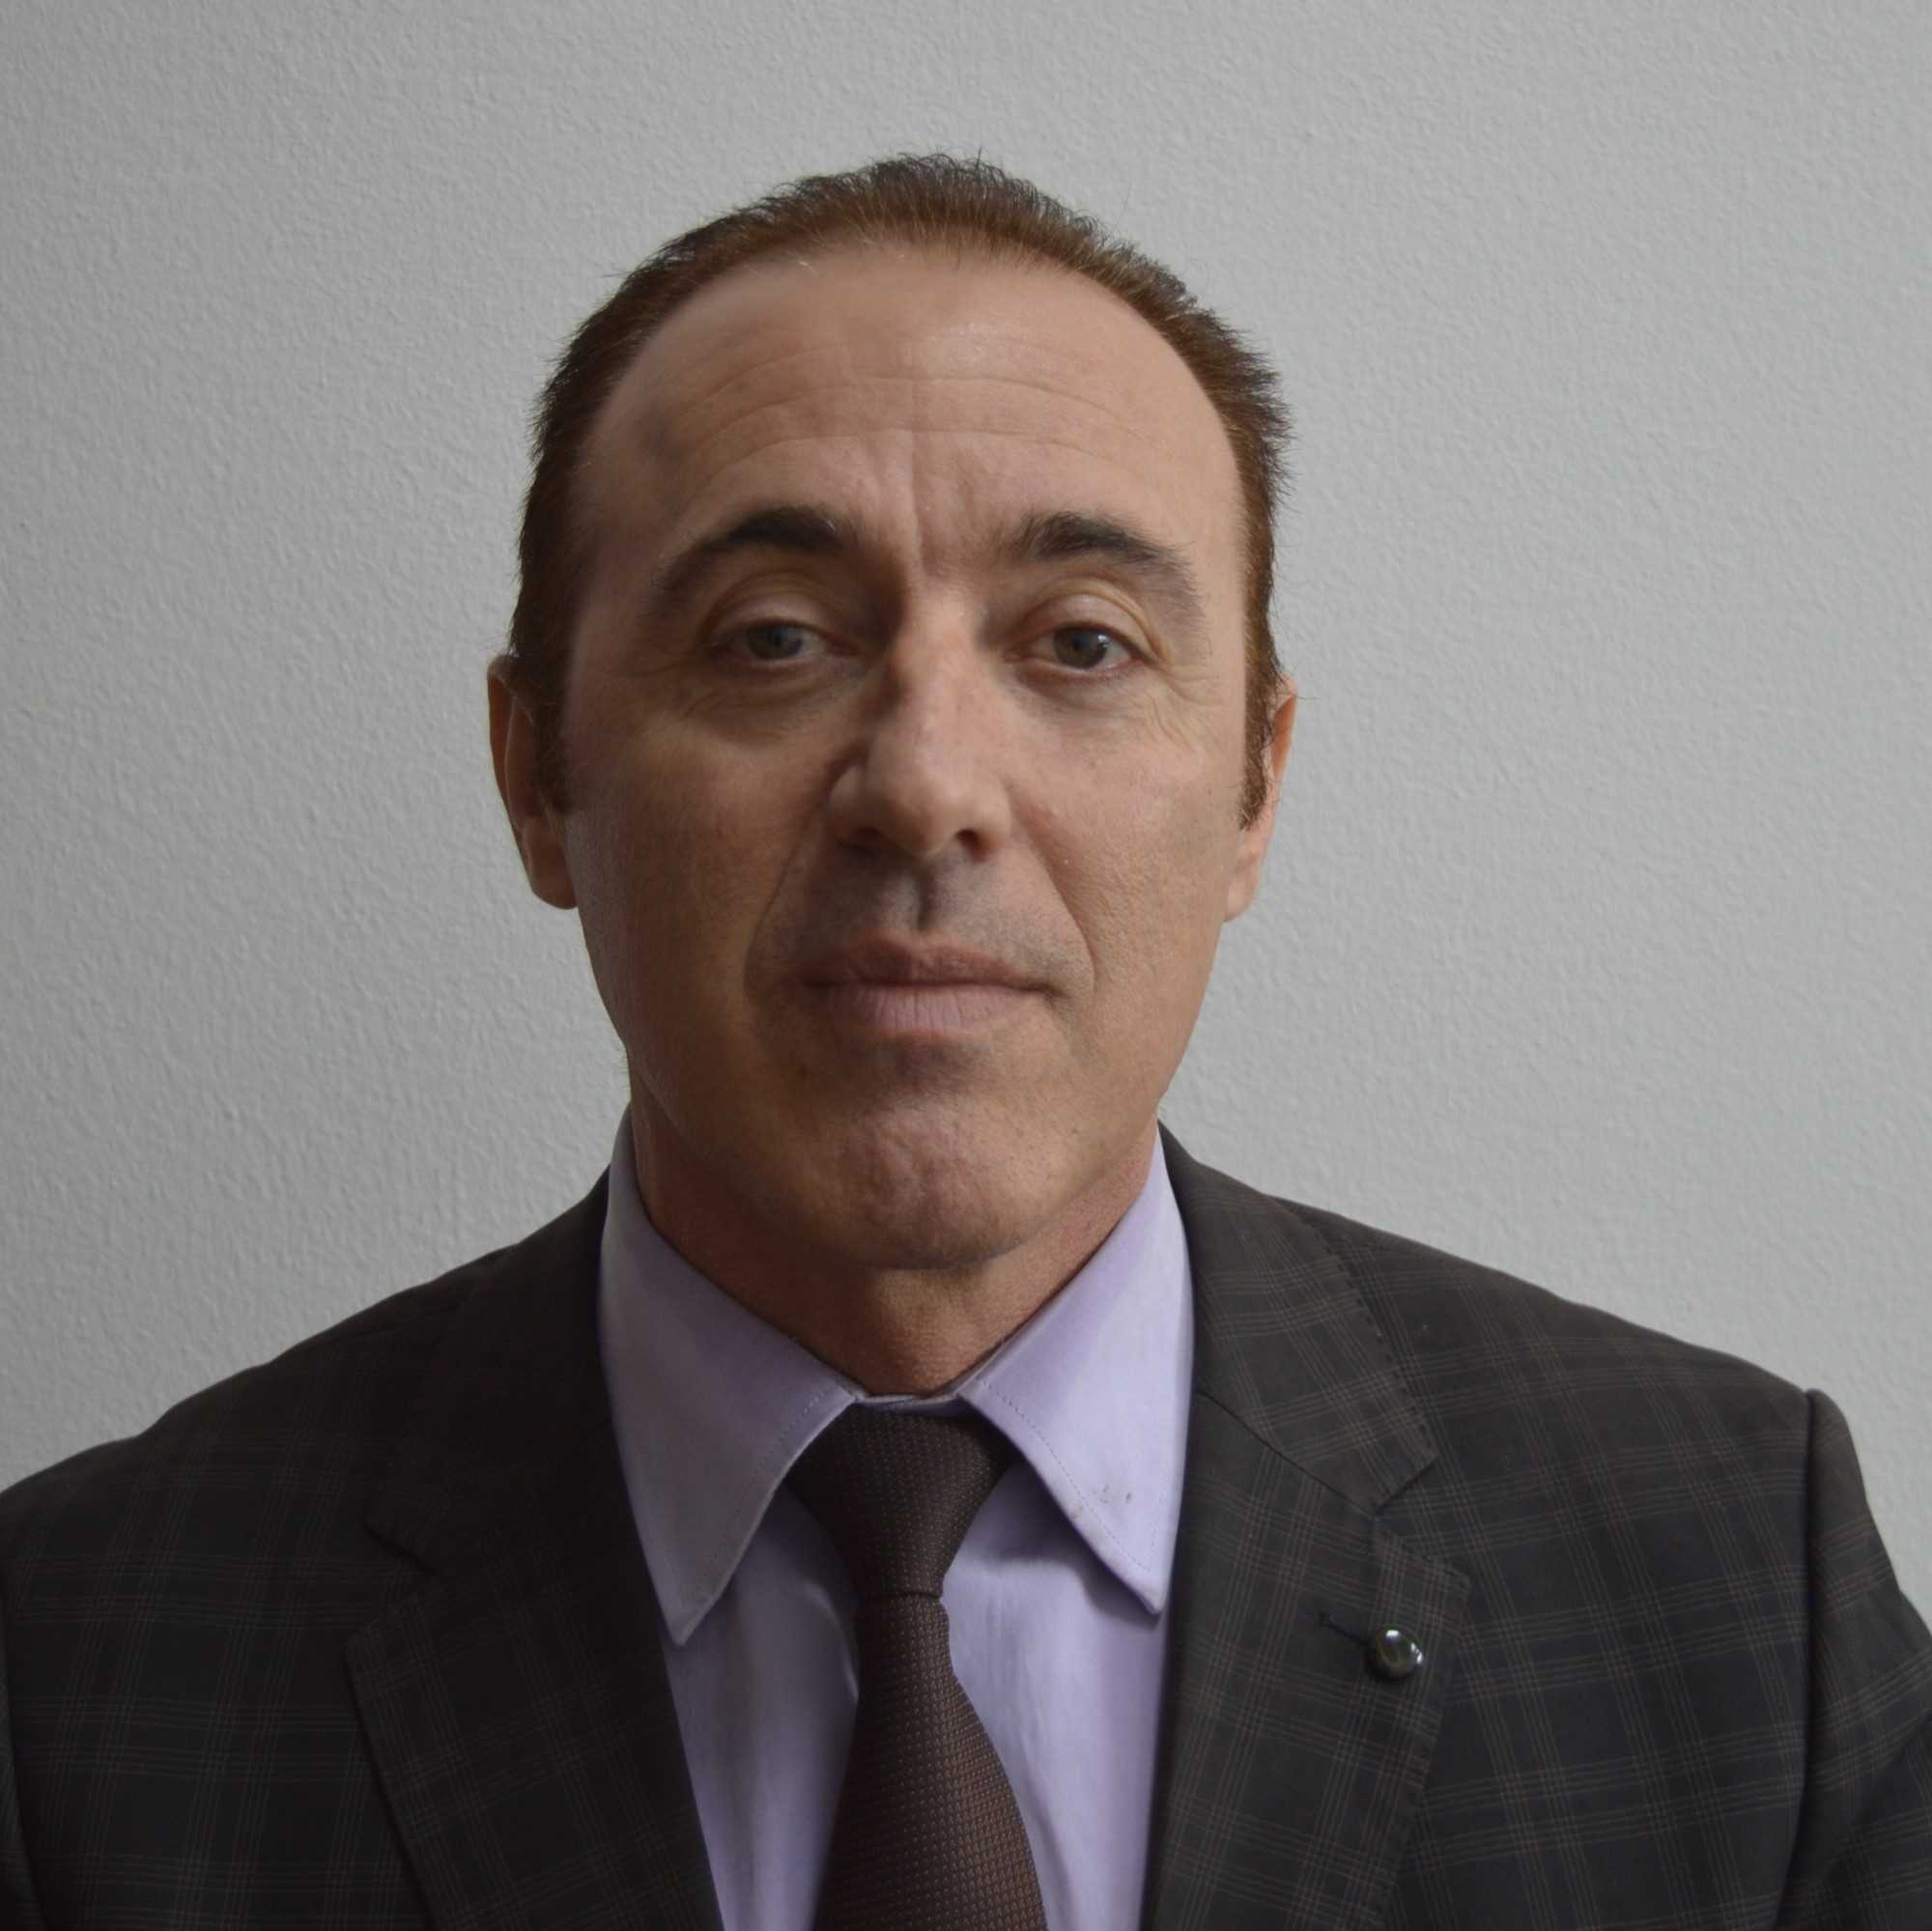 Rexhep Selimaj